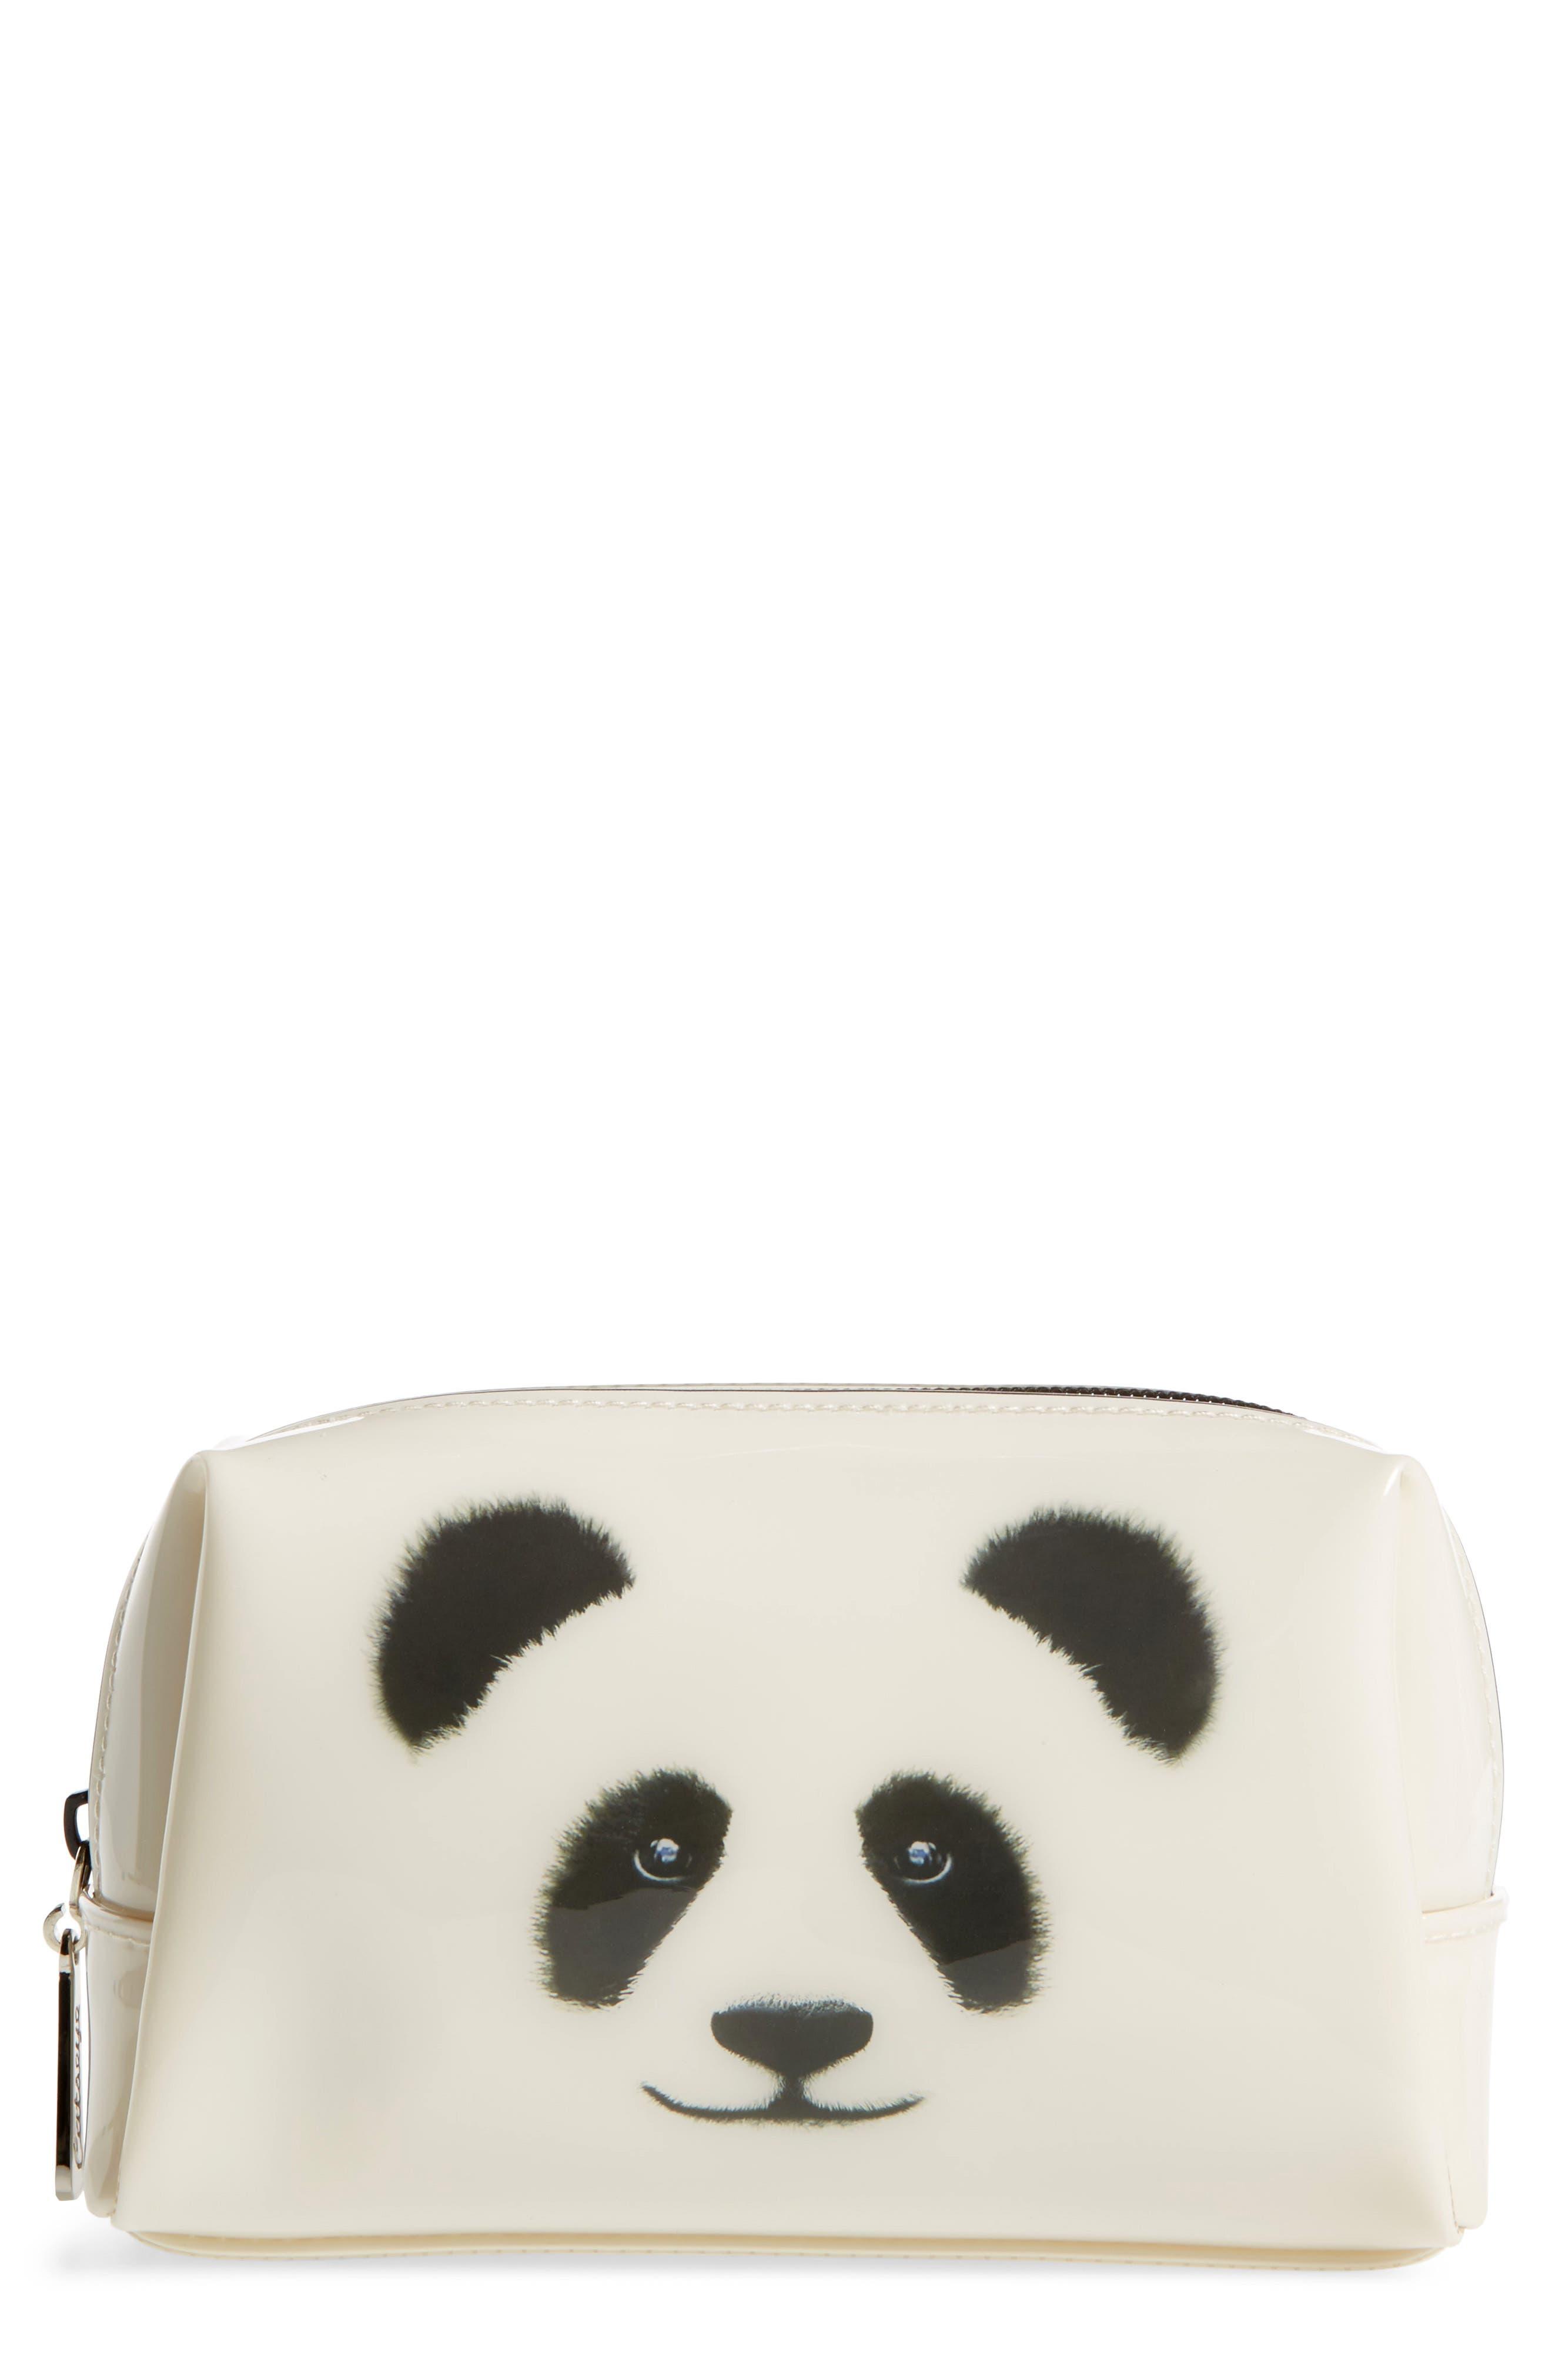 Alternate Image 1 Selected - Catseye London Monochrome Panda Cosmetics Bag